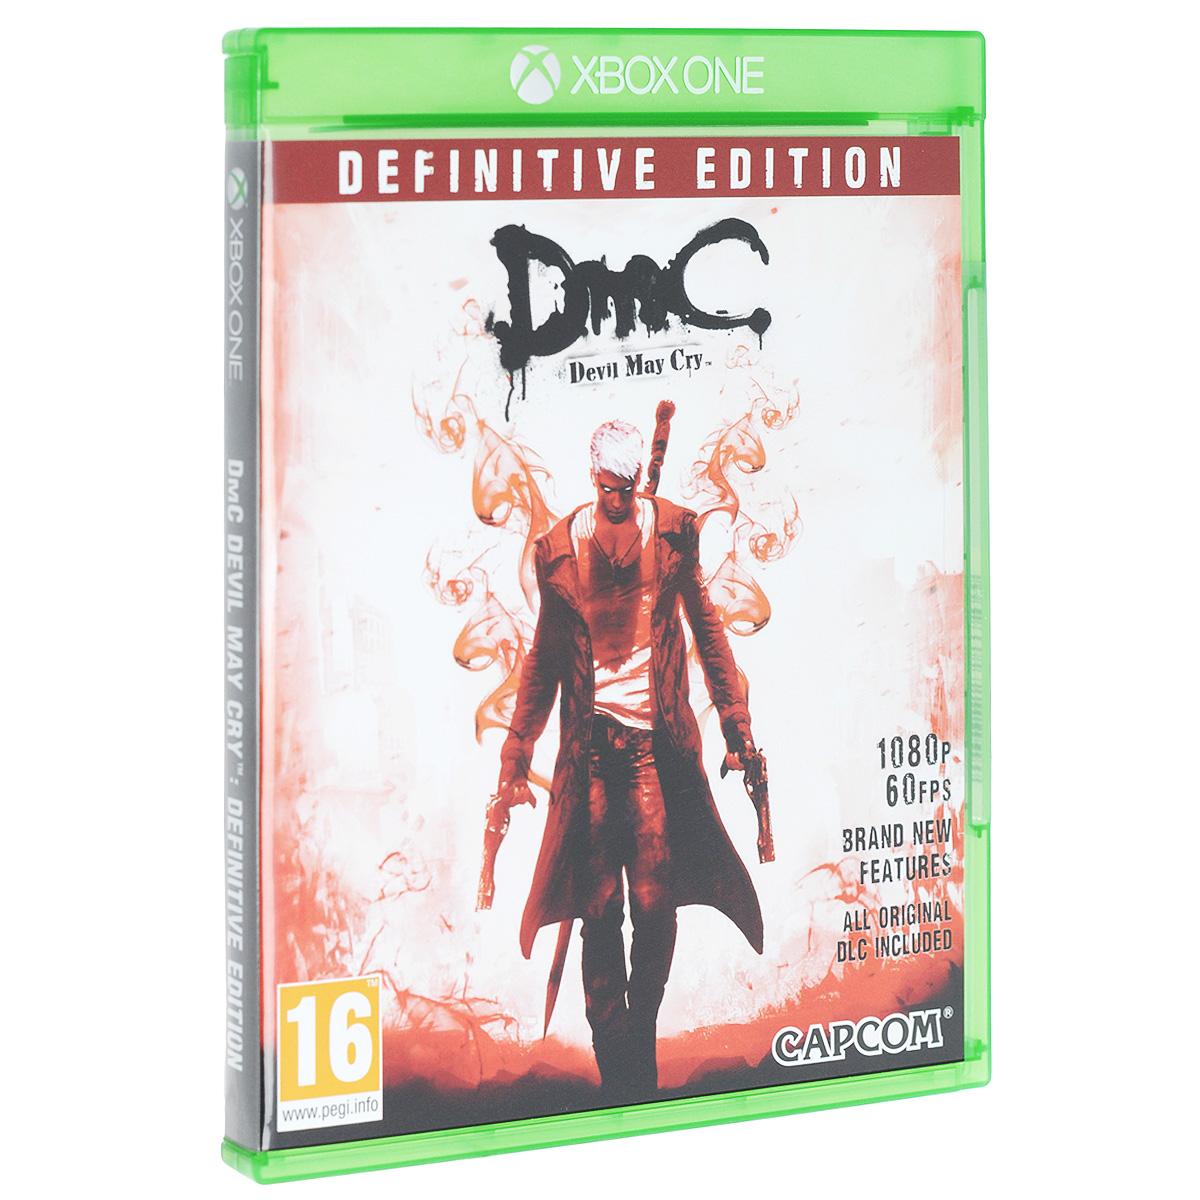 DmC Devil May Cry. Definitive Edition (Xbox One) dmc devil may cry definitive edition игра для xbox one